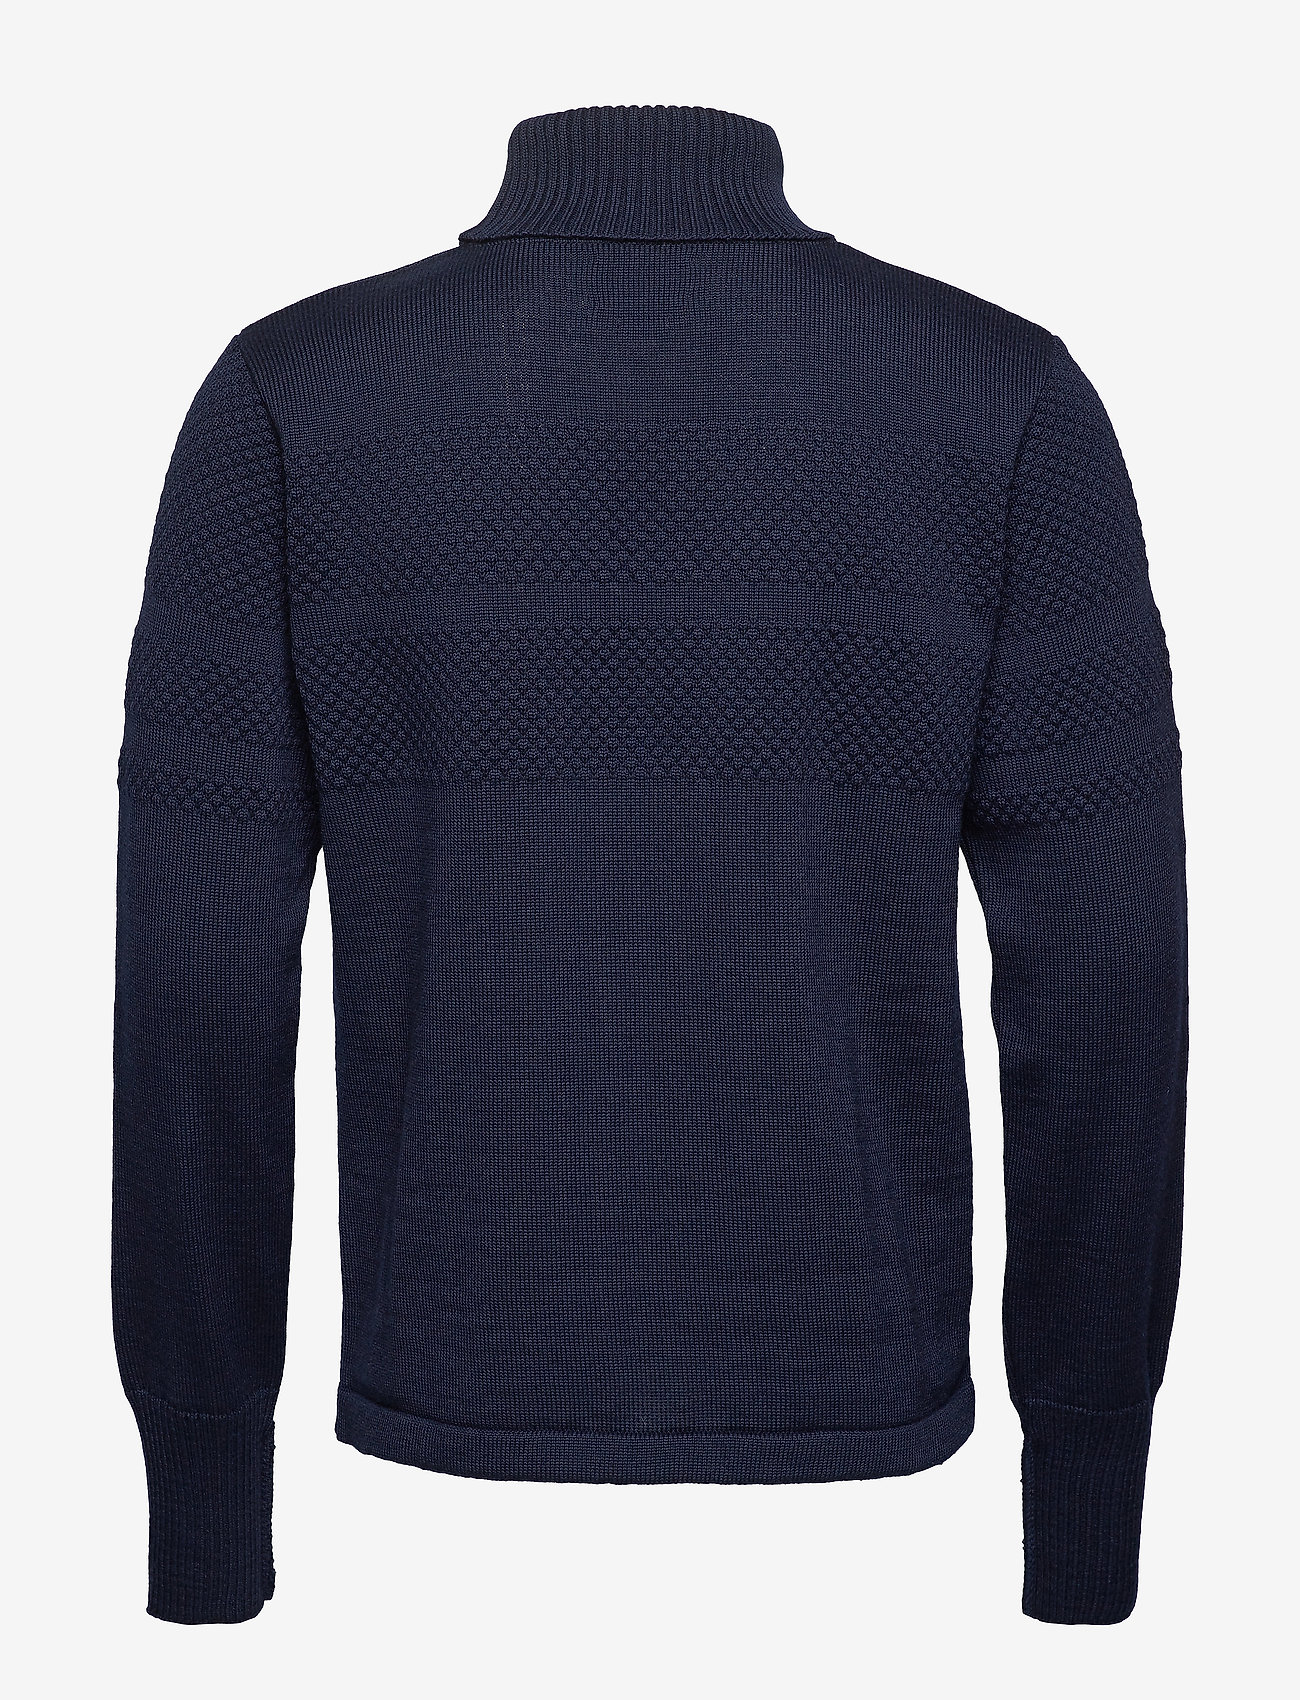 Mads Nørgaard 100% Wool Klemens - Strikkevarer NAVY - Menn Klær